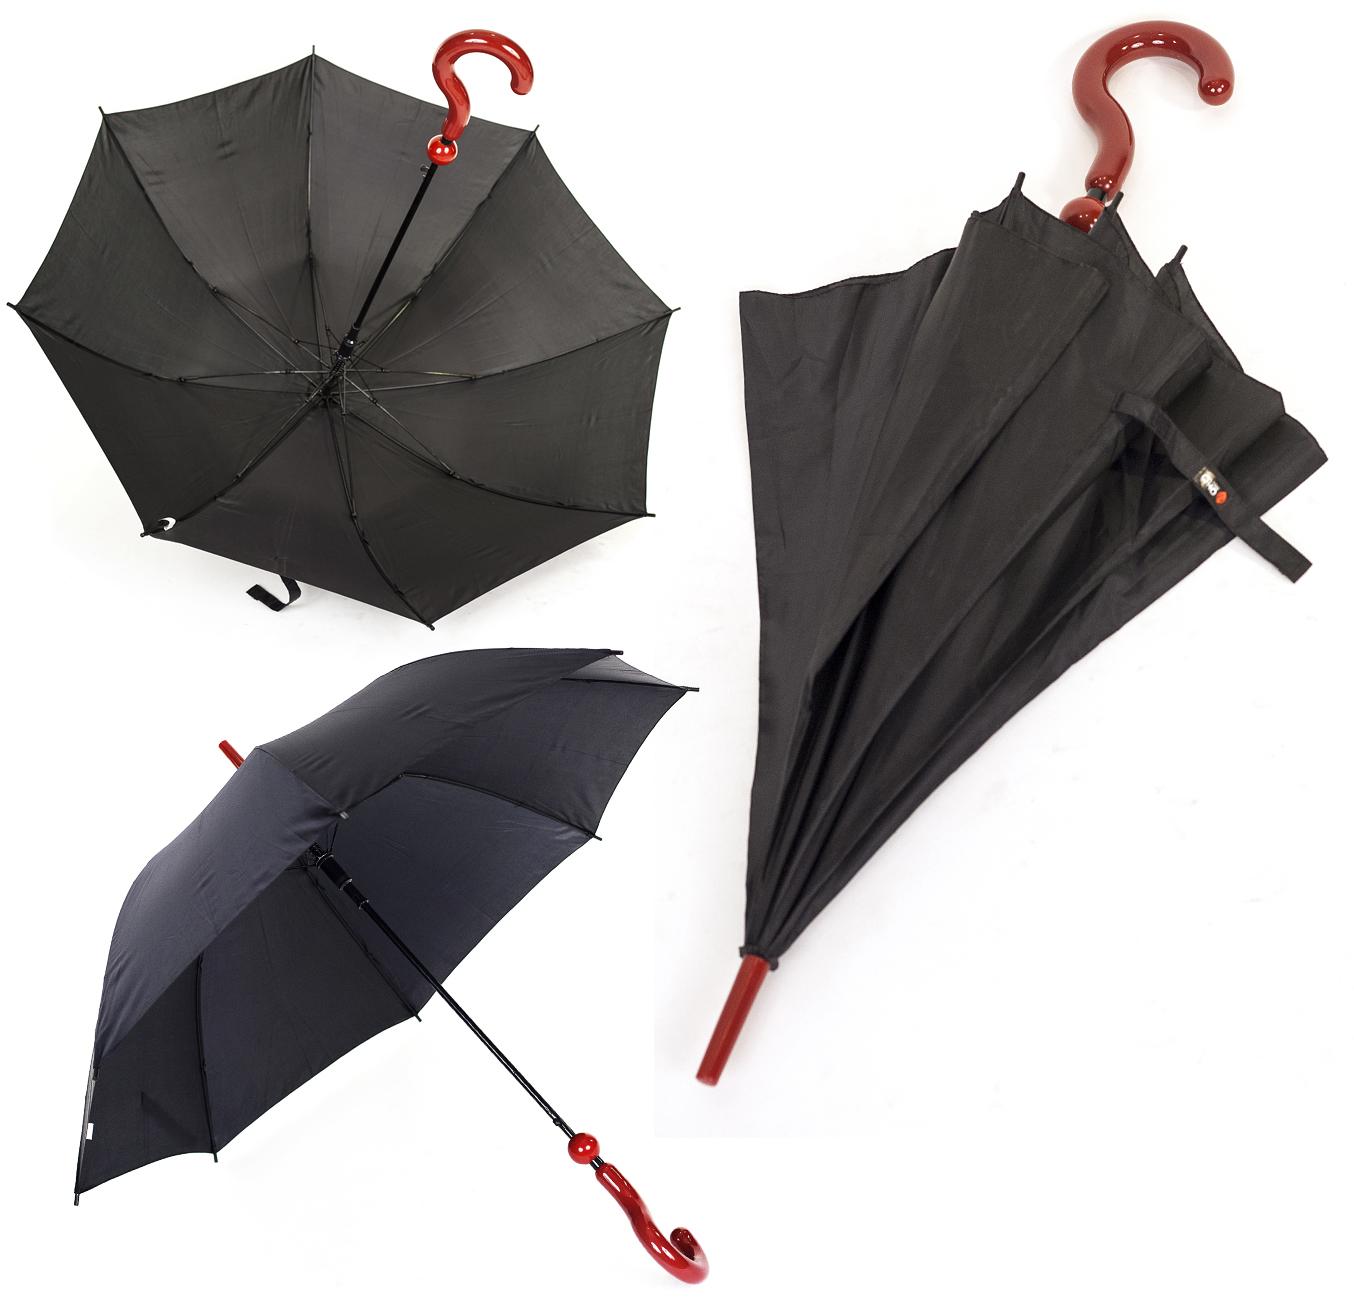 Doctor who umbrella replica